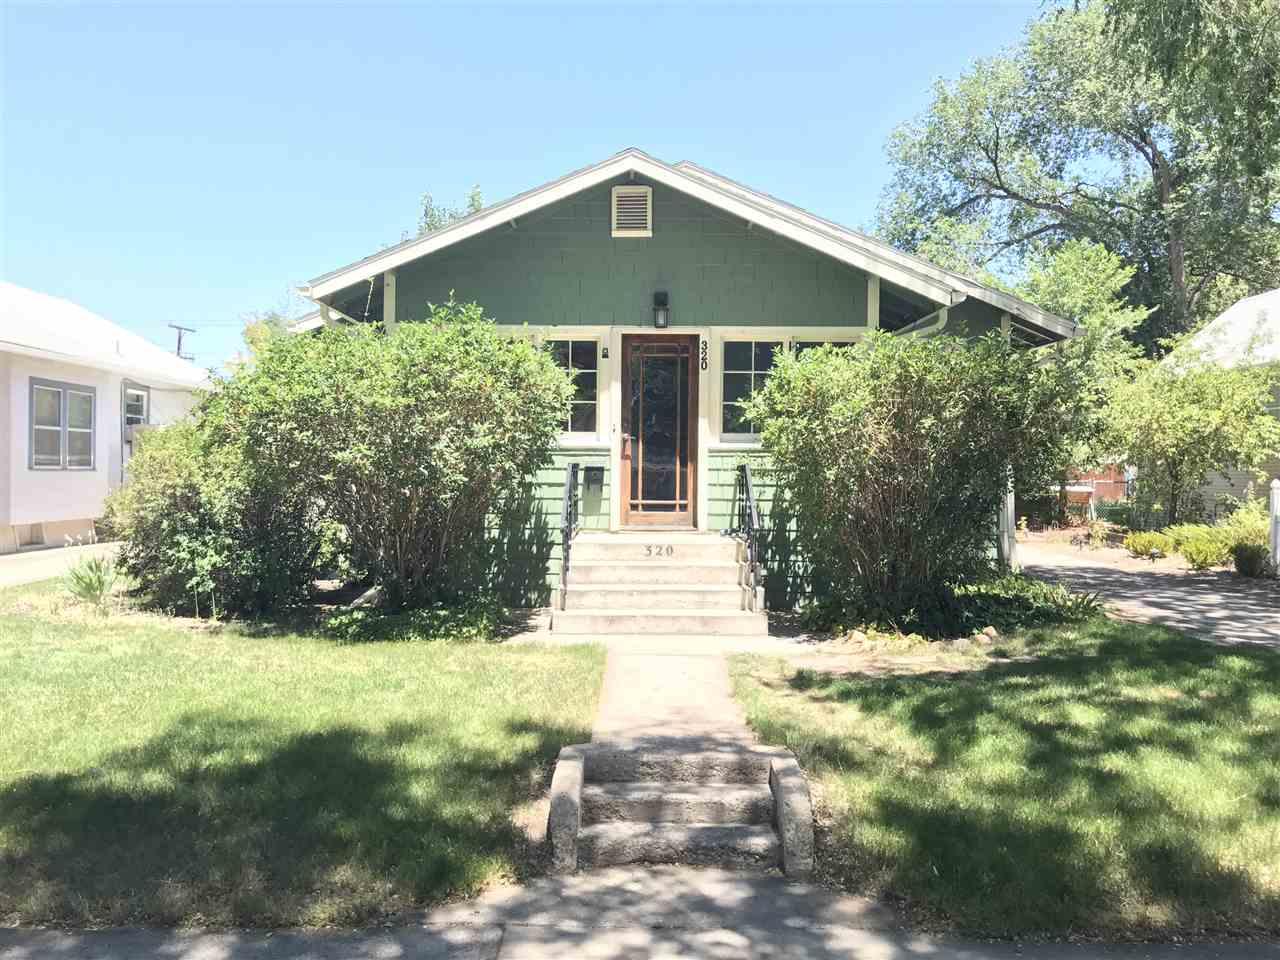 320 Gunnison Avenue, Grand Junction, CO 81501